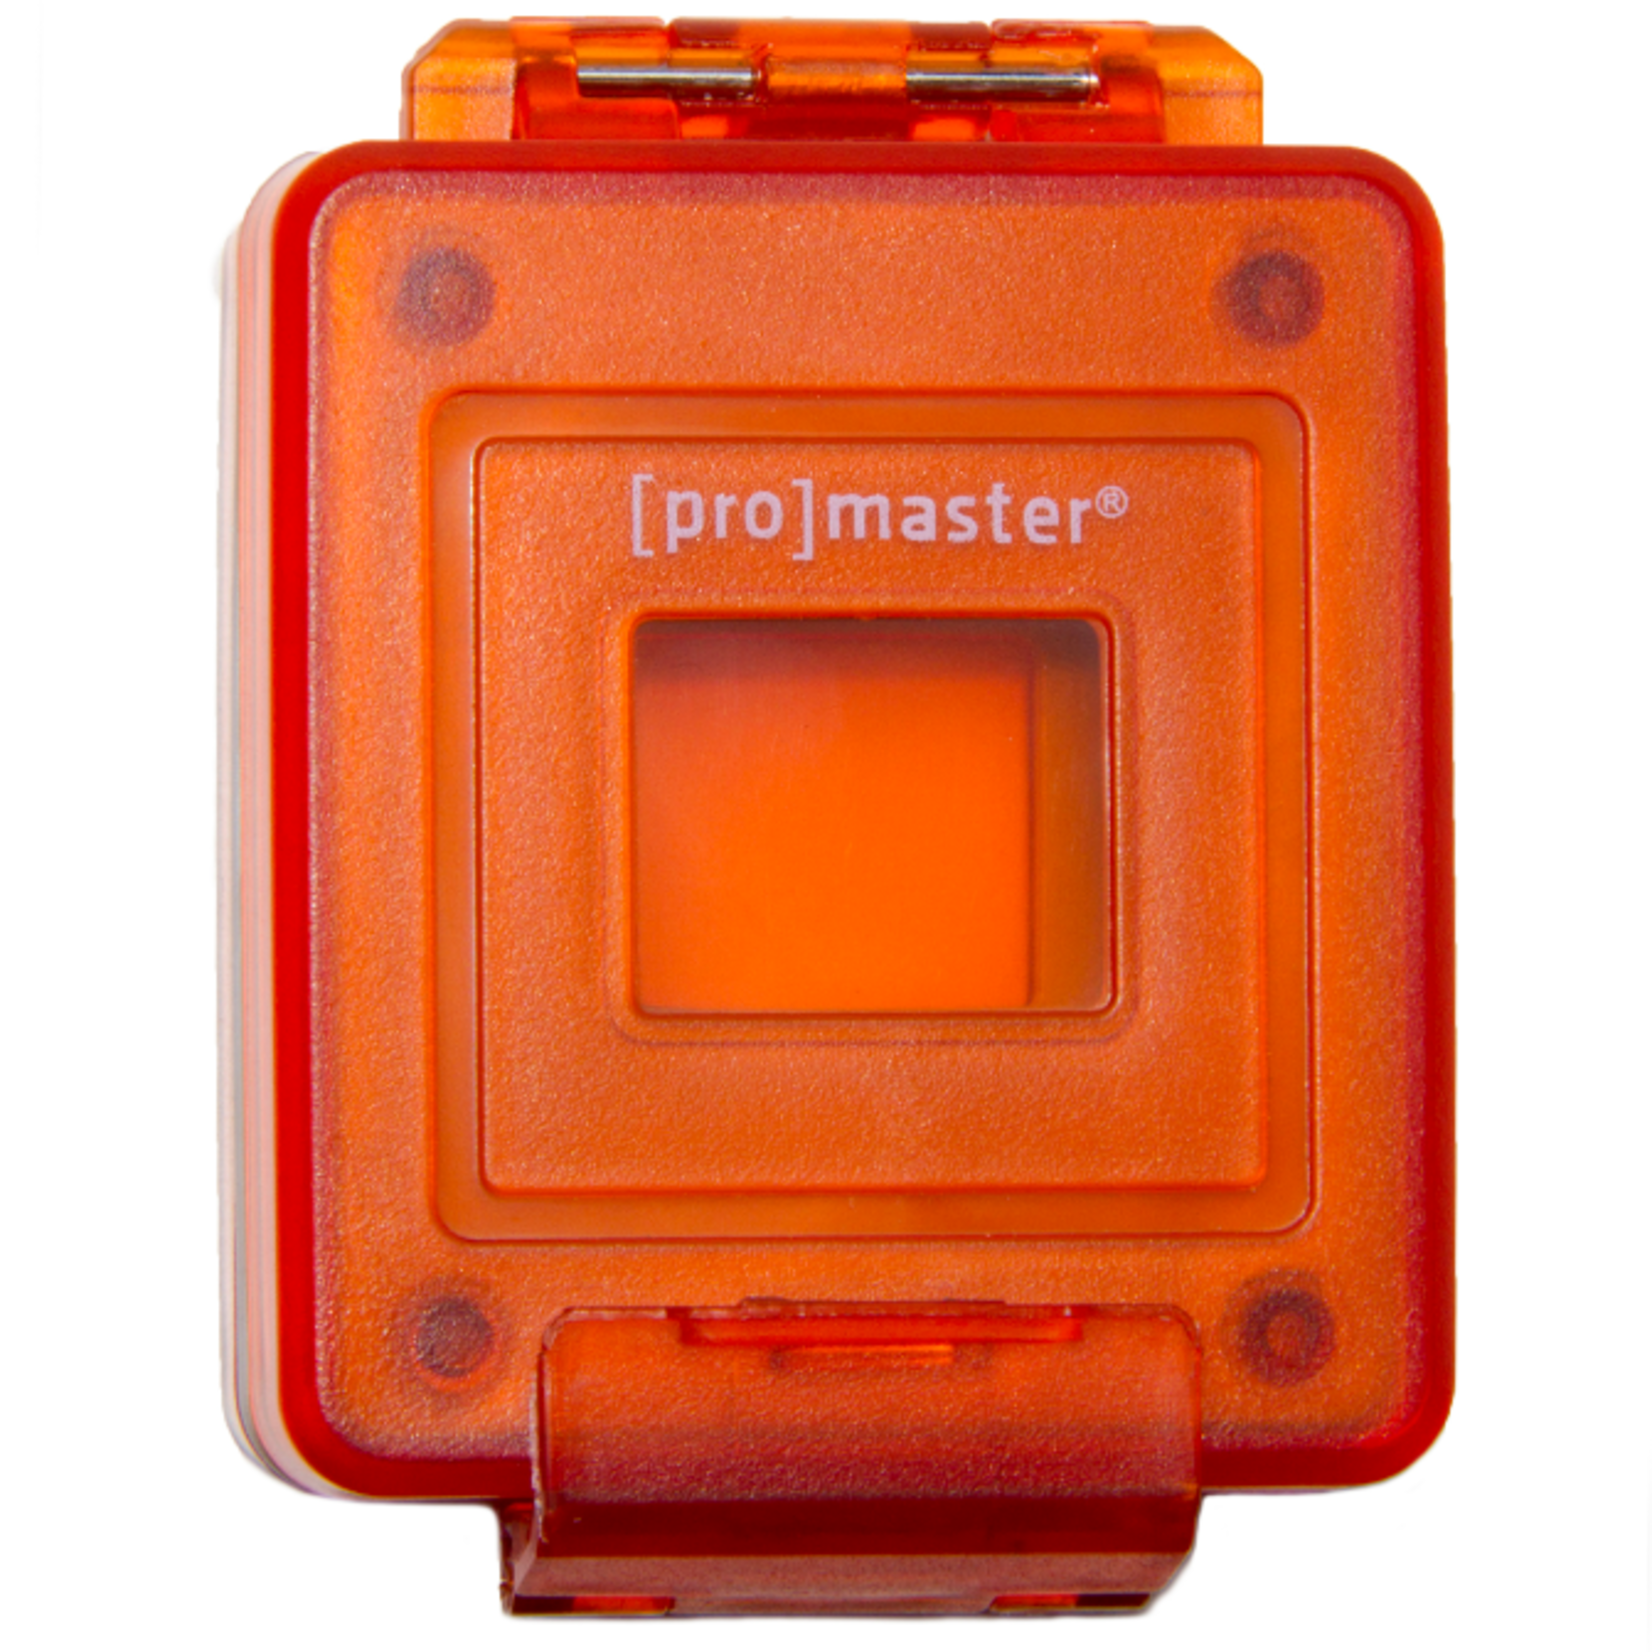 ProMaster ProMaster weatherproof card case